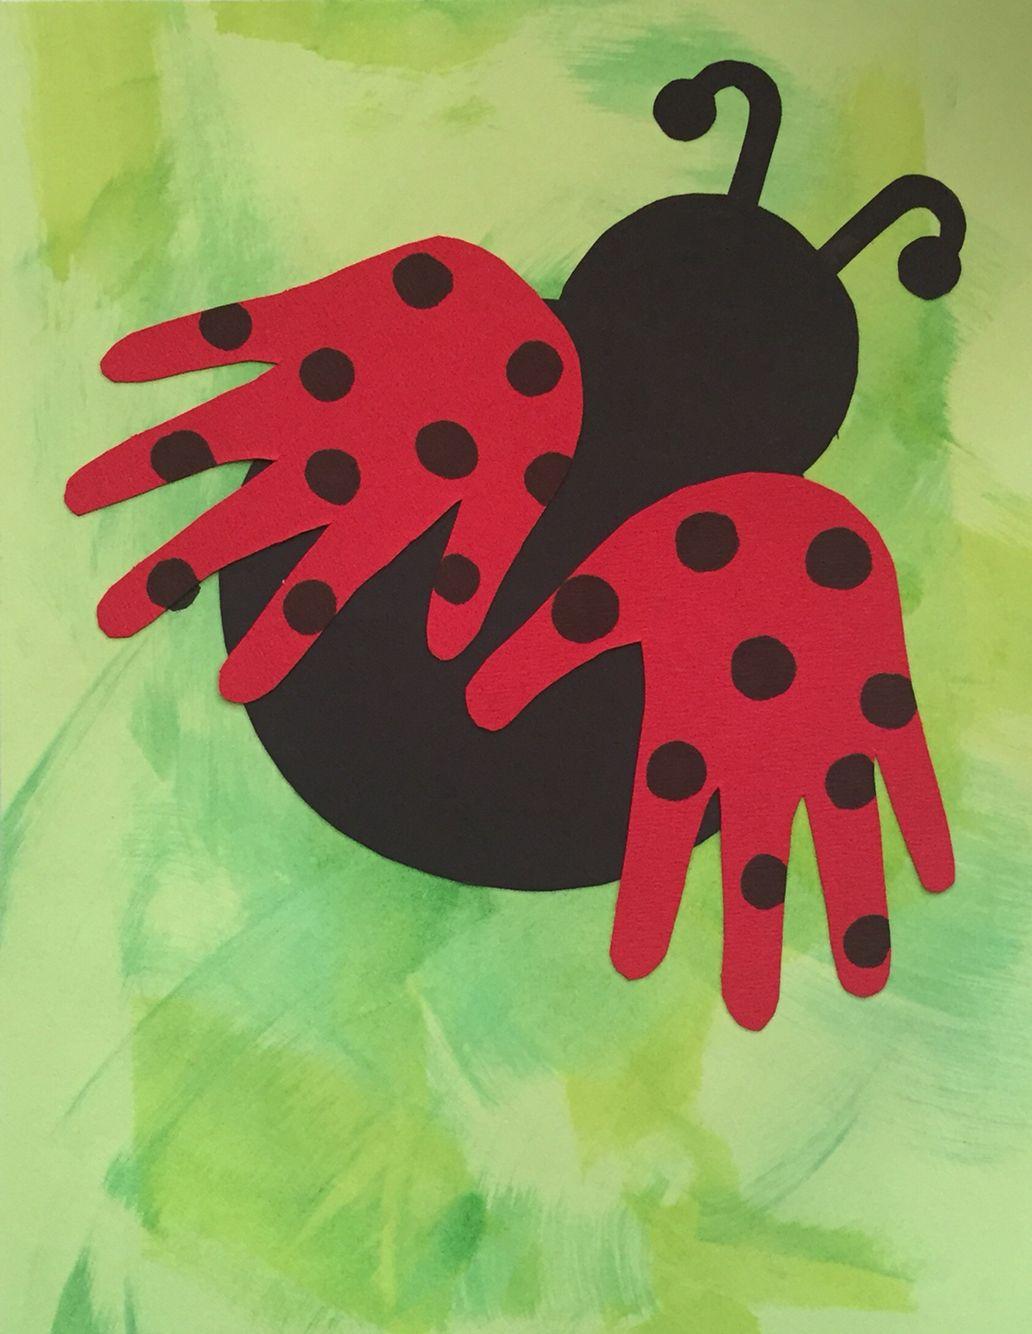 ladybug handprints for cover of preschool memory books pre k